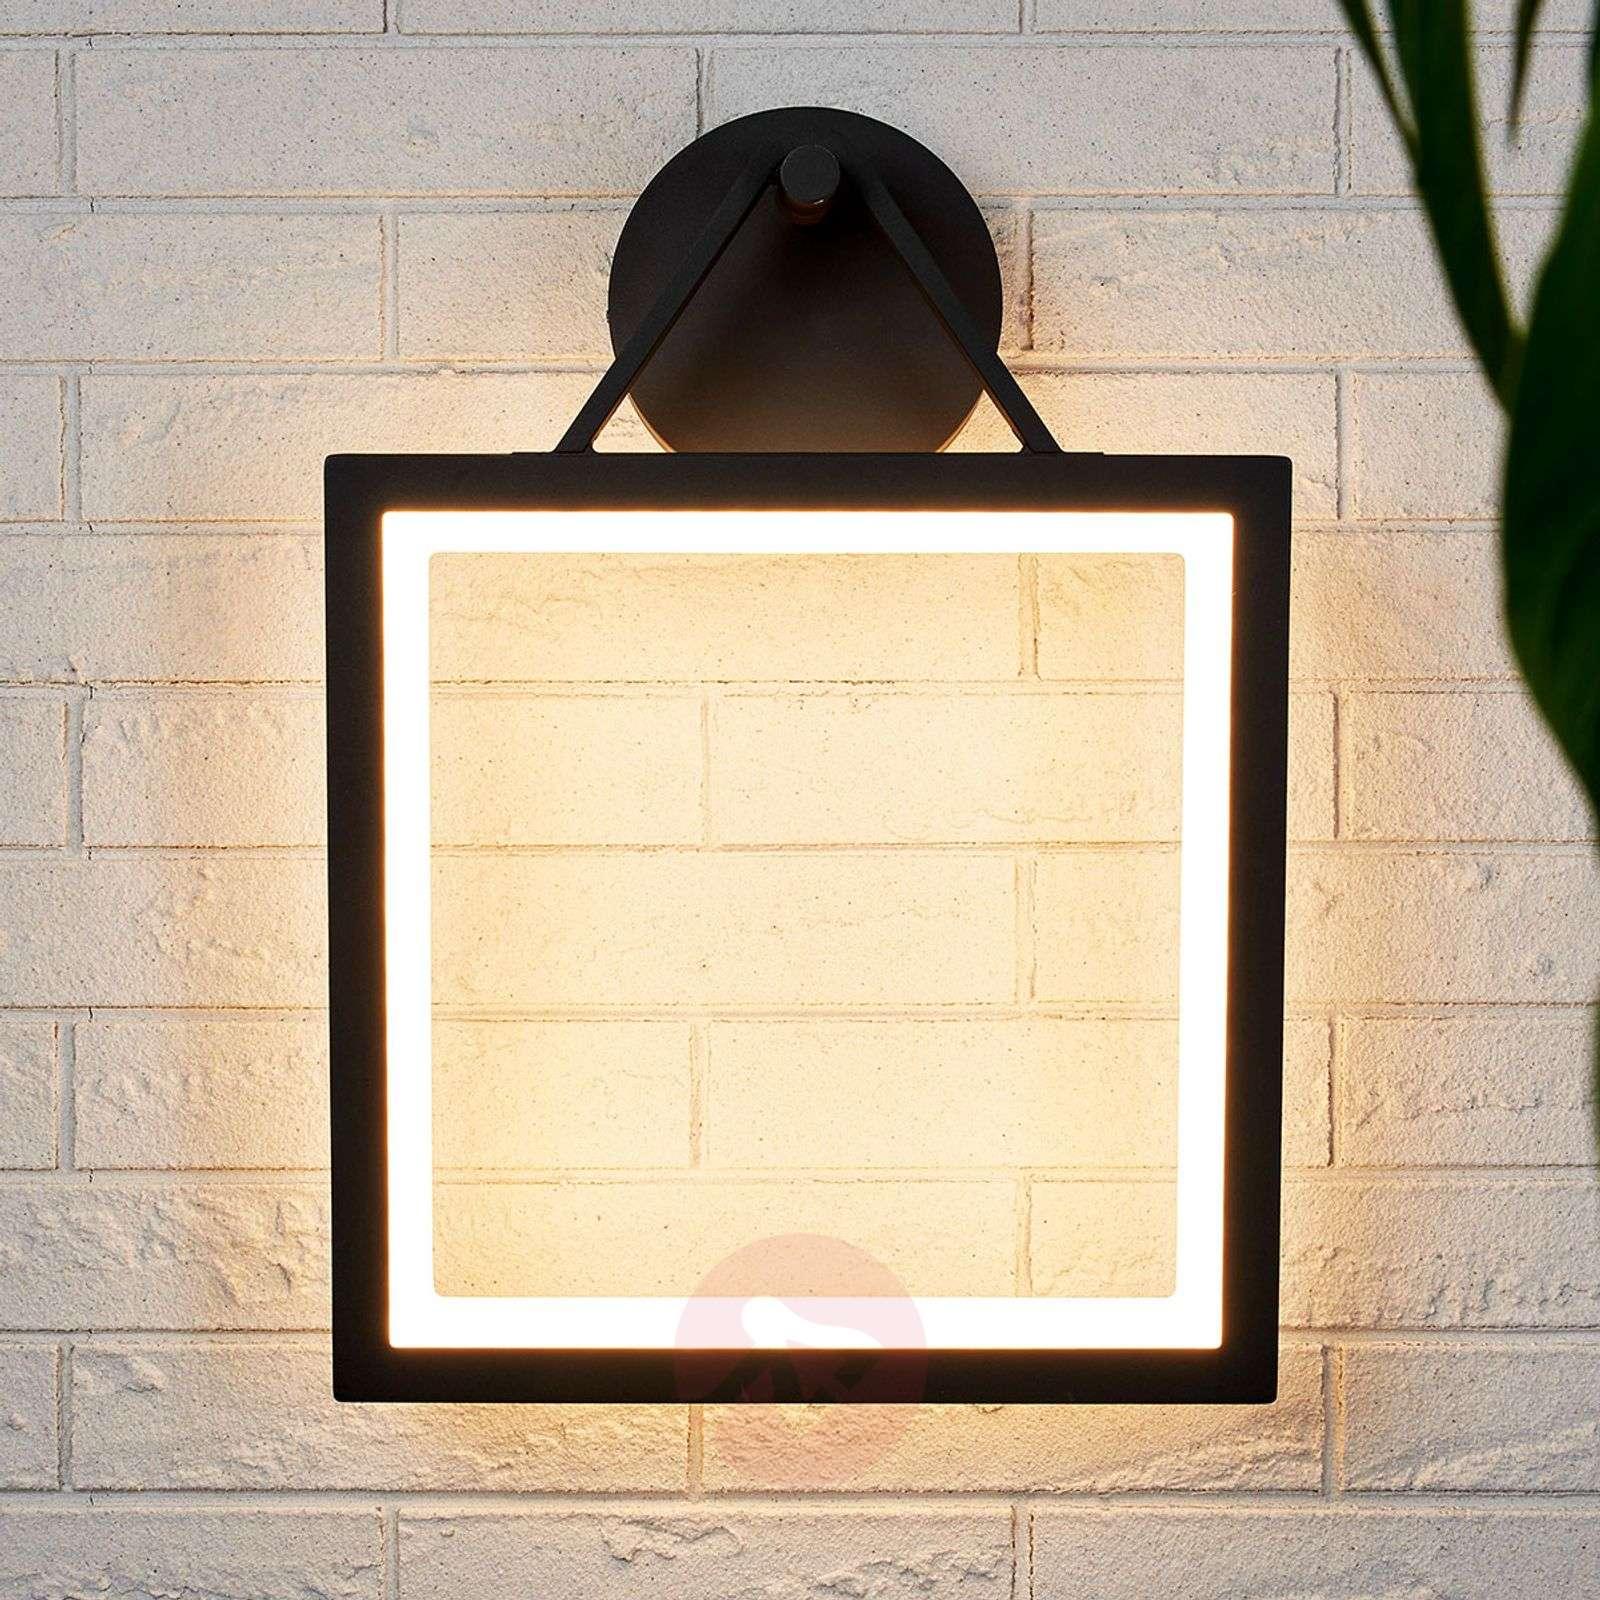 Lamp Led Wall Outdoor Frame Shaped Mirco QderxBCoW